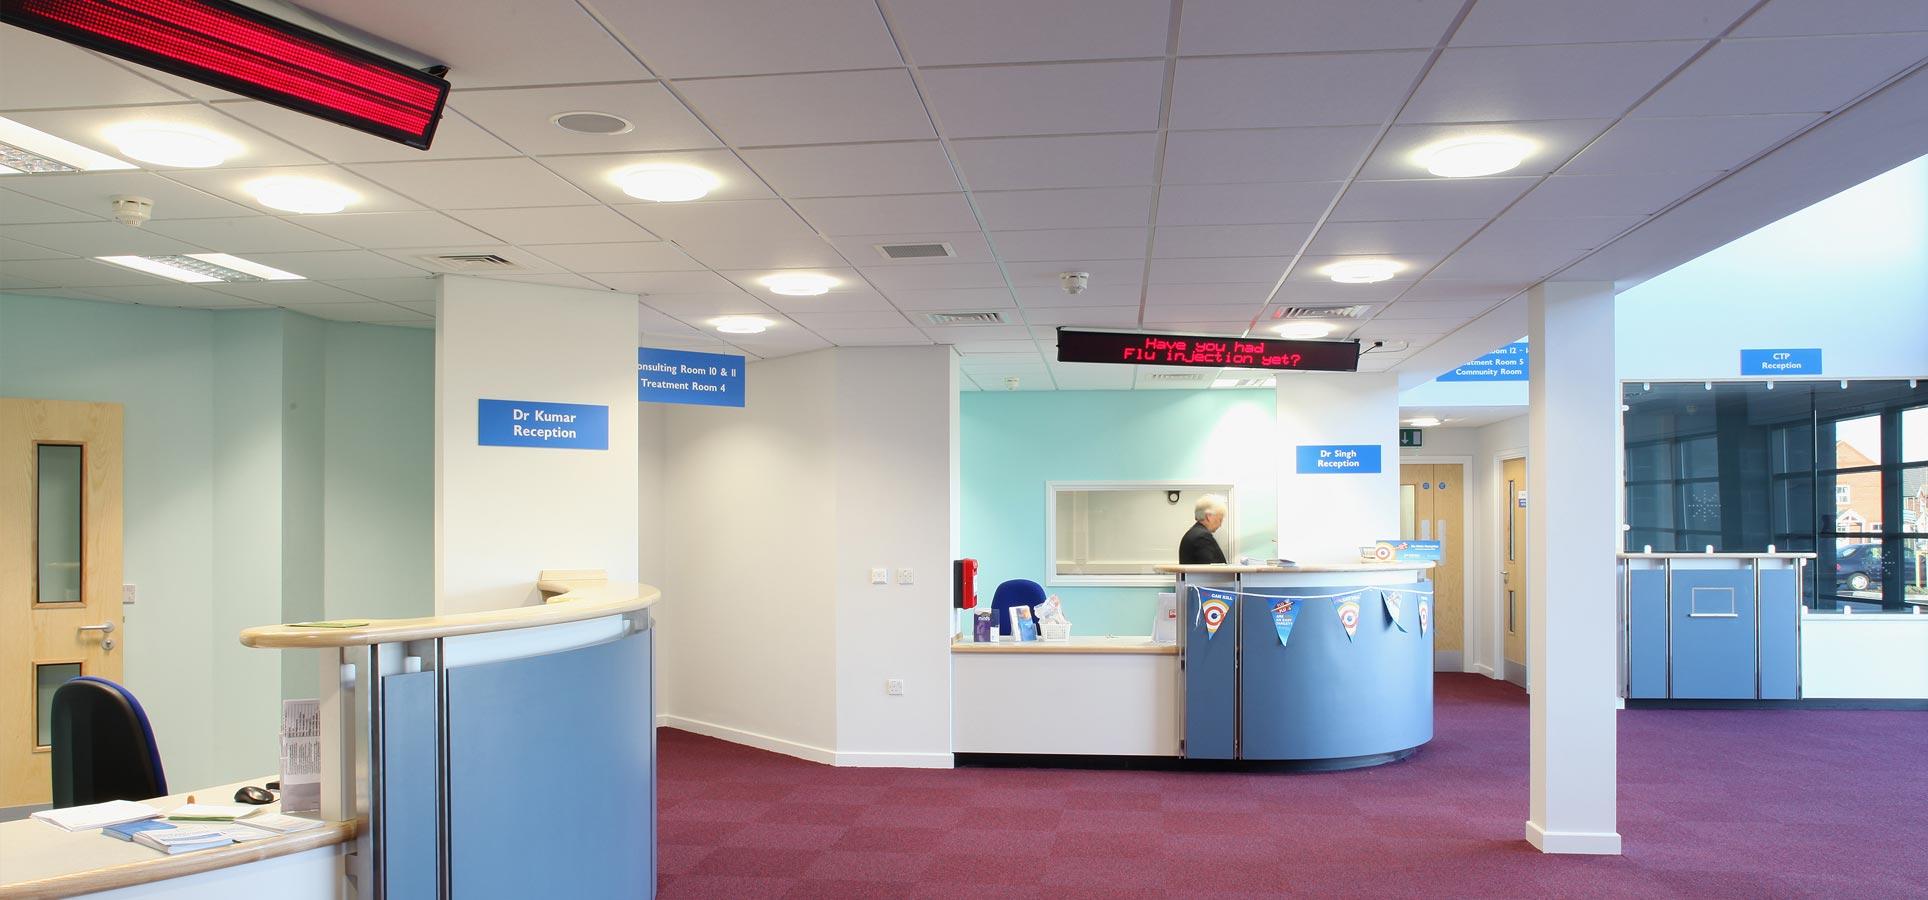 Cromwell Primary Care CTR, Jessops Construction Ltd